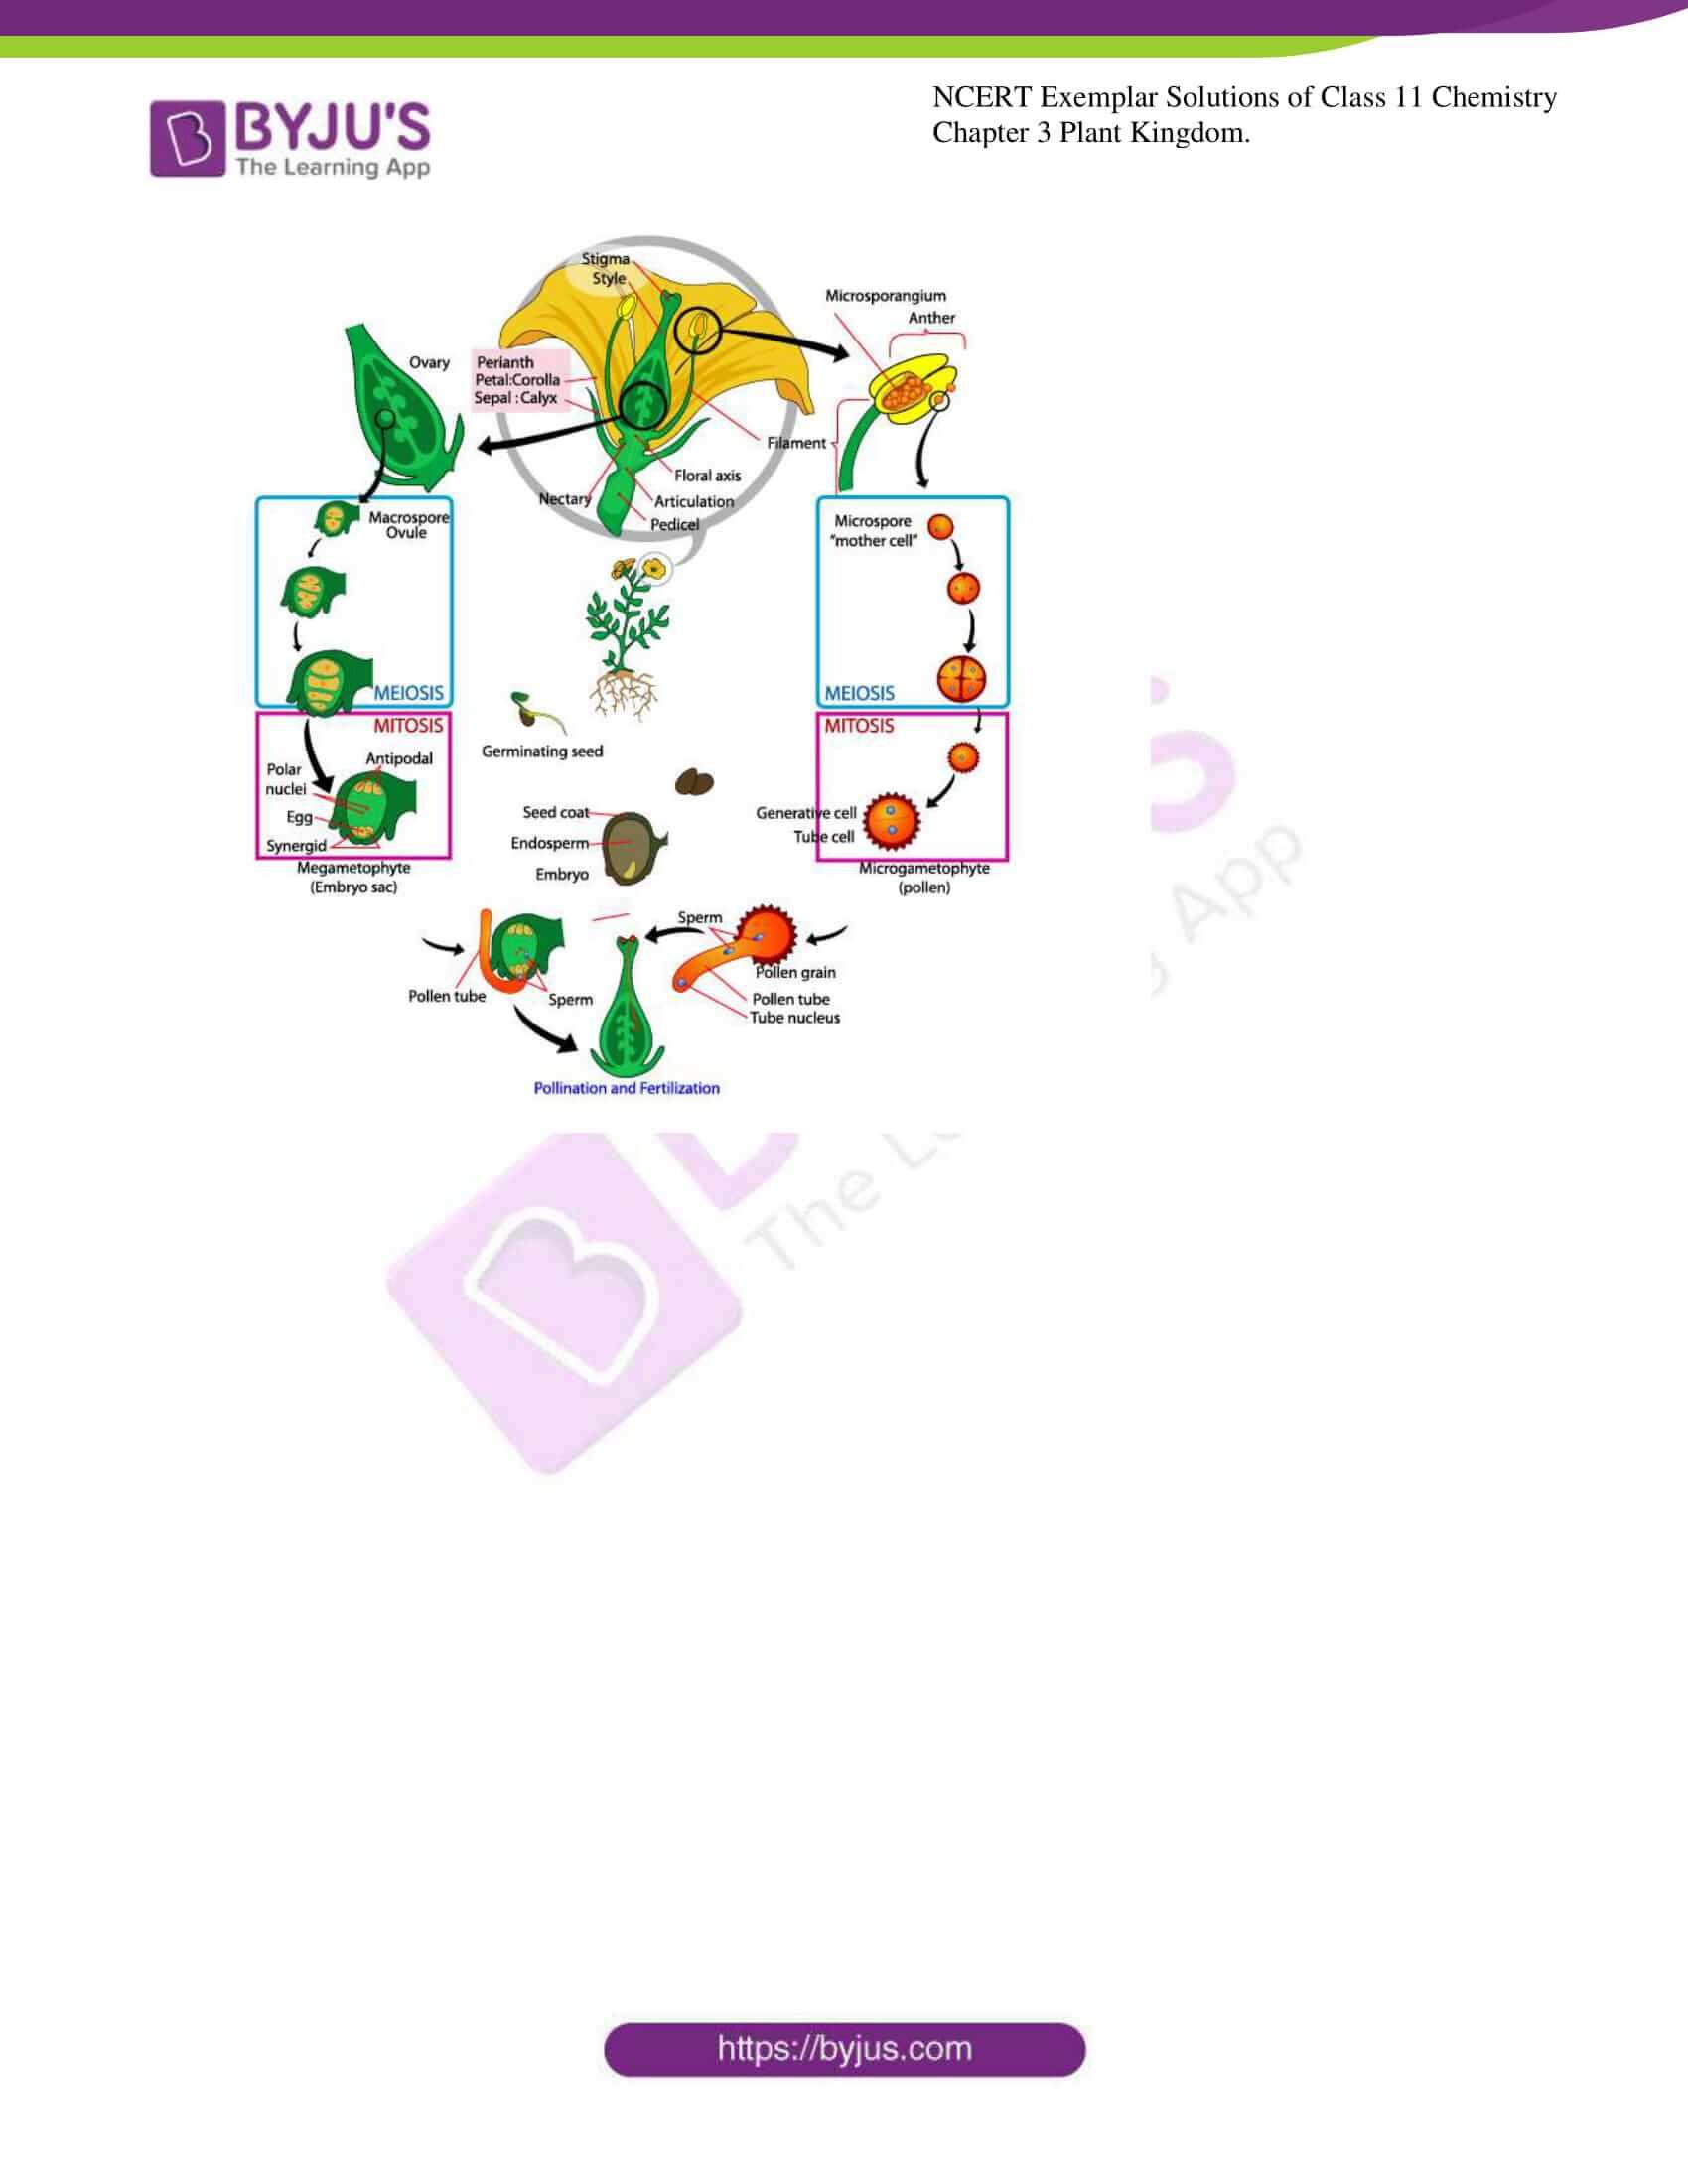 ncert exemplar solutions for class 11 bio chapter 3 9